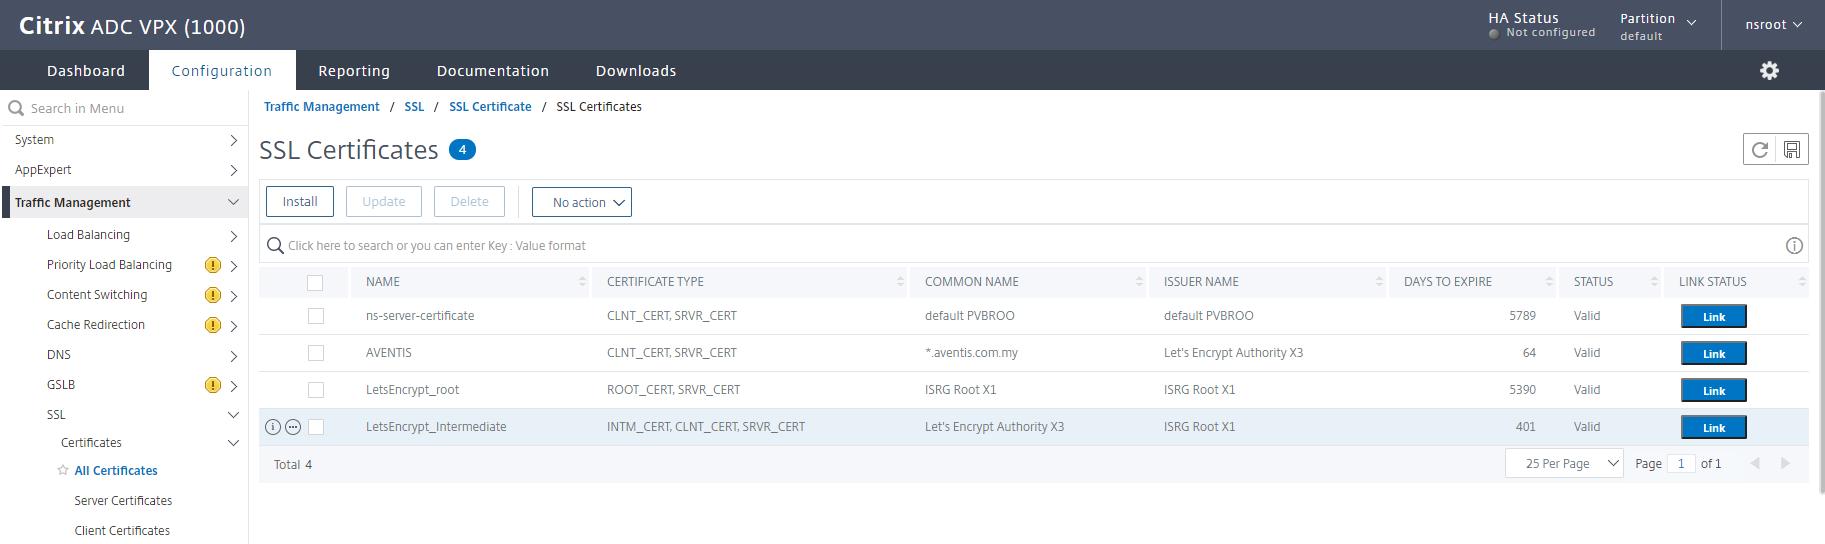 import pfx certificate to netscaler vpx